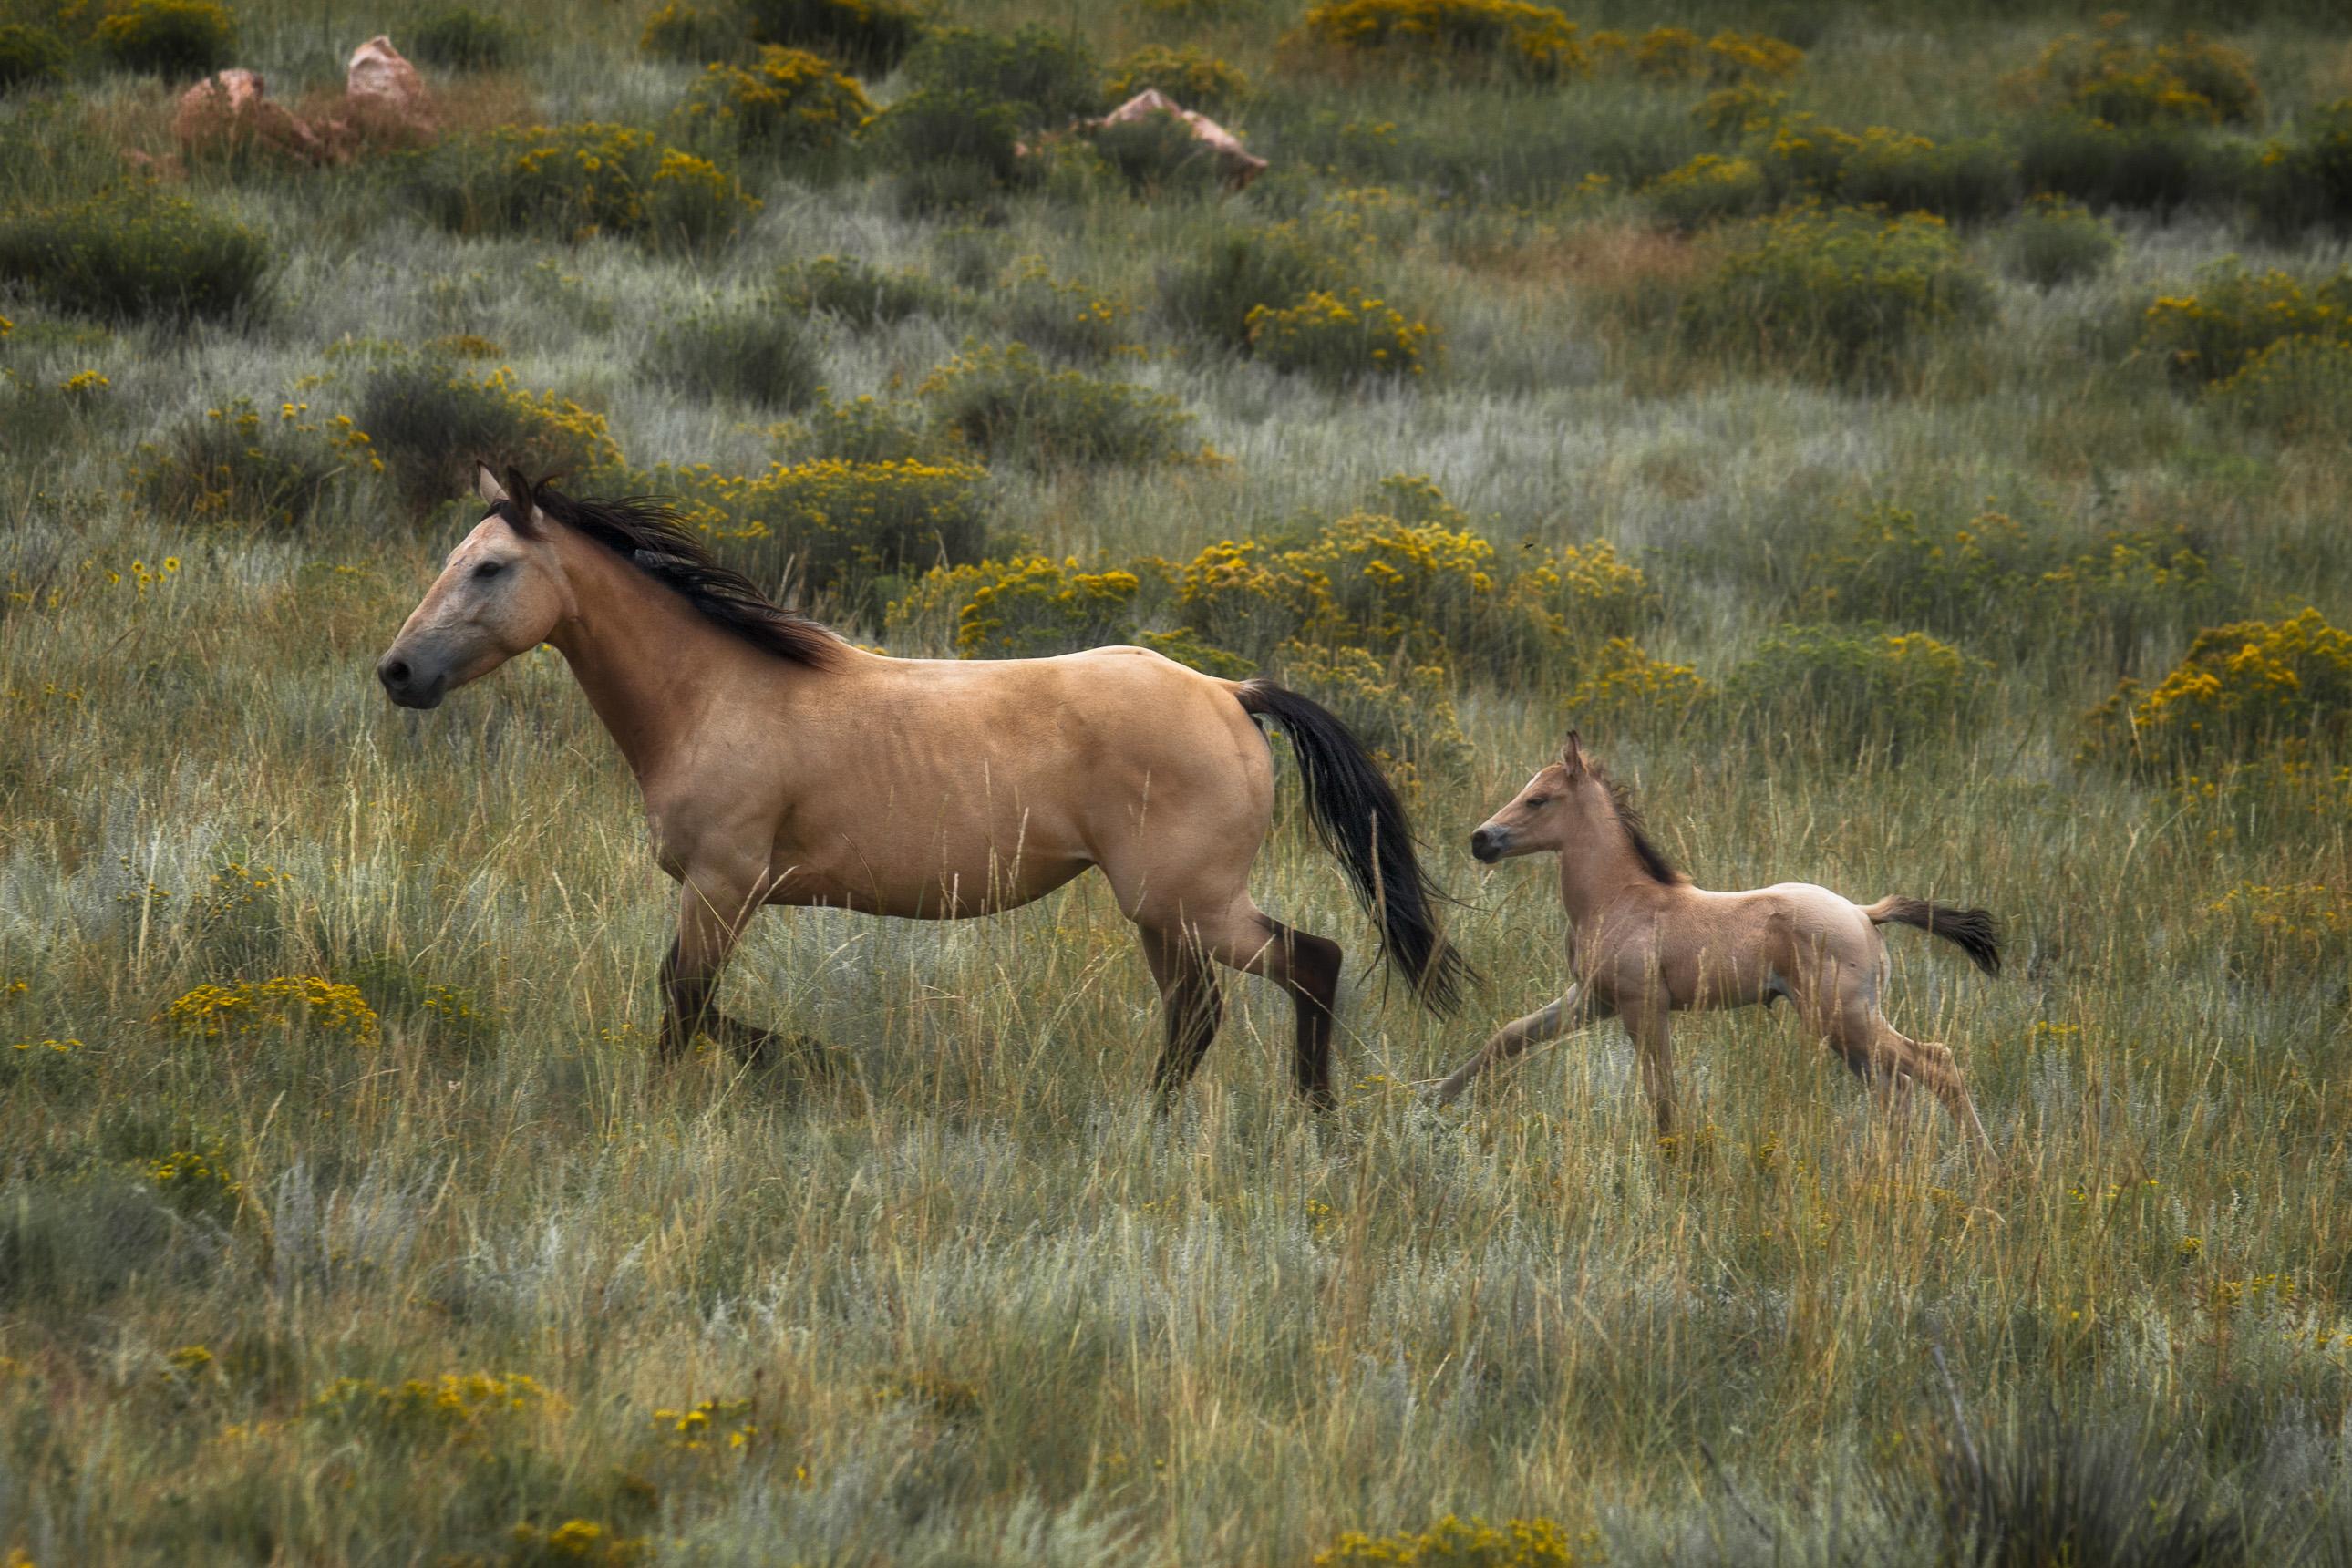 Mother And Baby Horse On A Ranch In Colorado Dan Sorensen